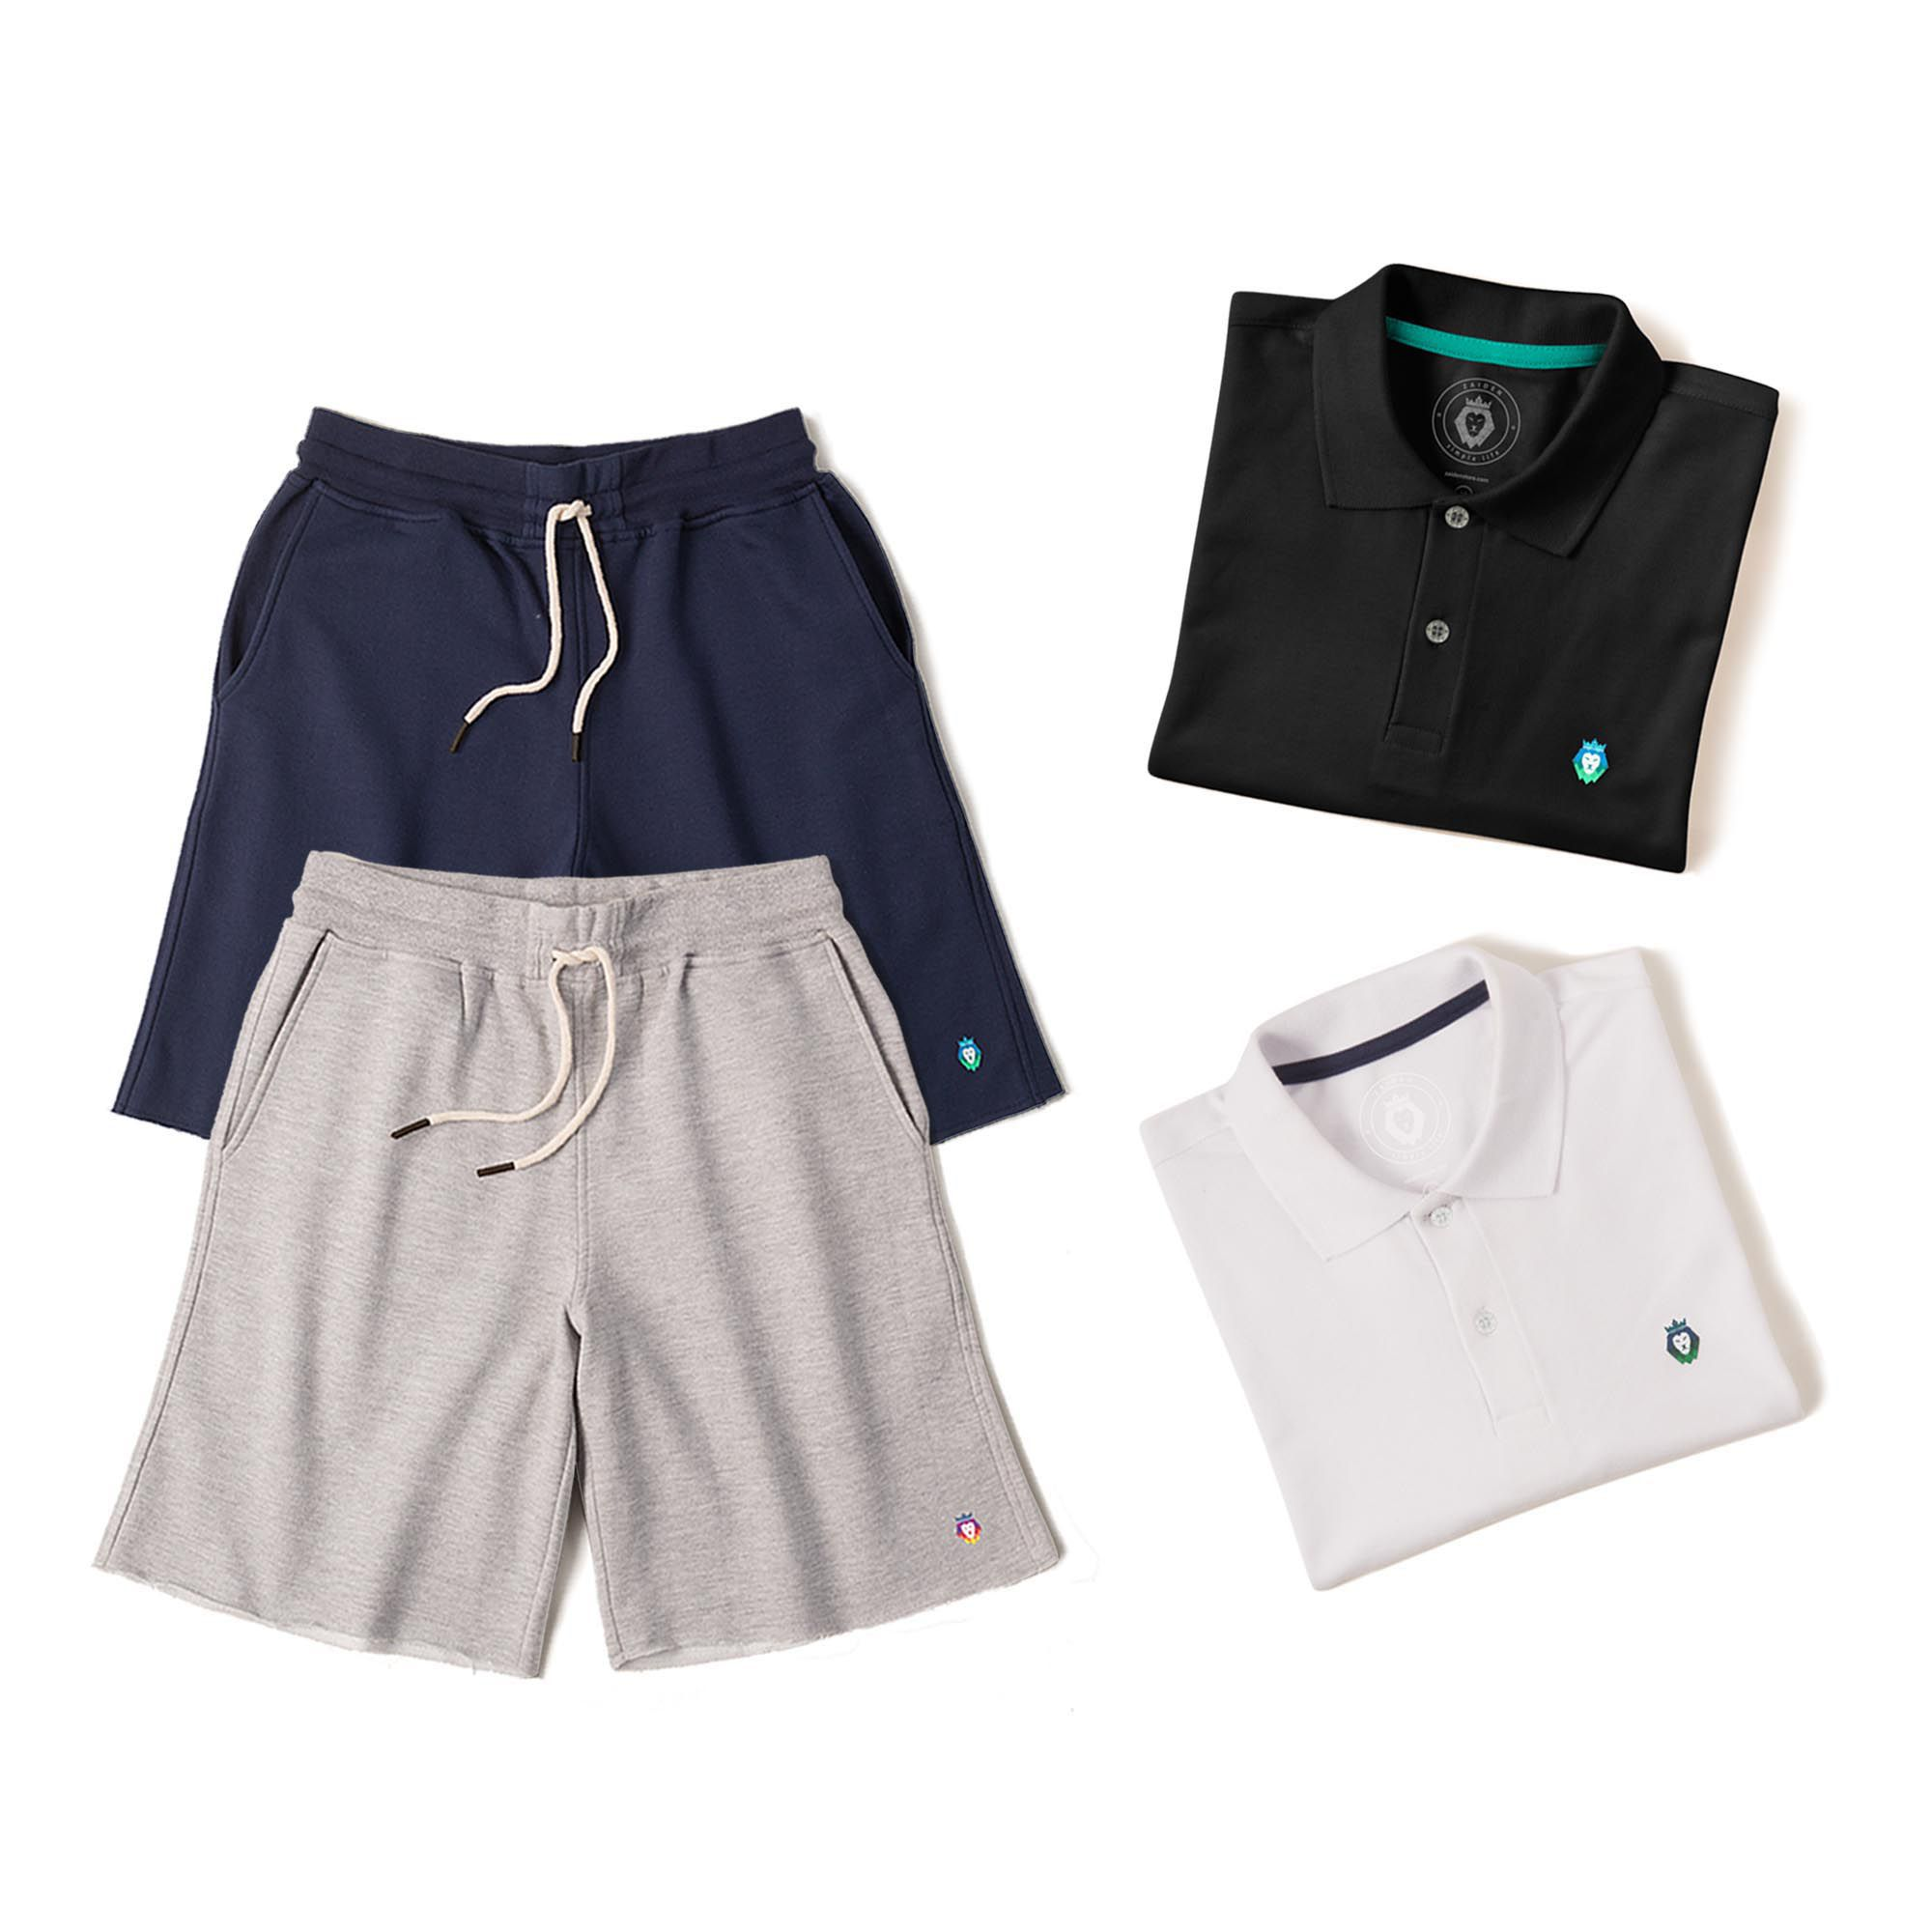 Kit 2 Bermudas Basic Azul Marinho Mescla + 2 Camisas Polo Style Preta Branca Zaiden Masculina